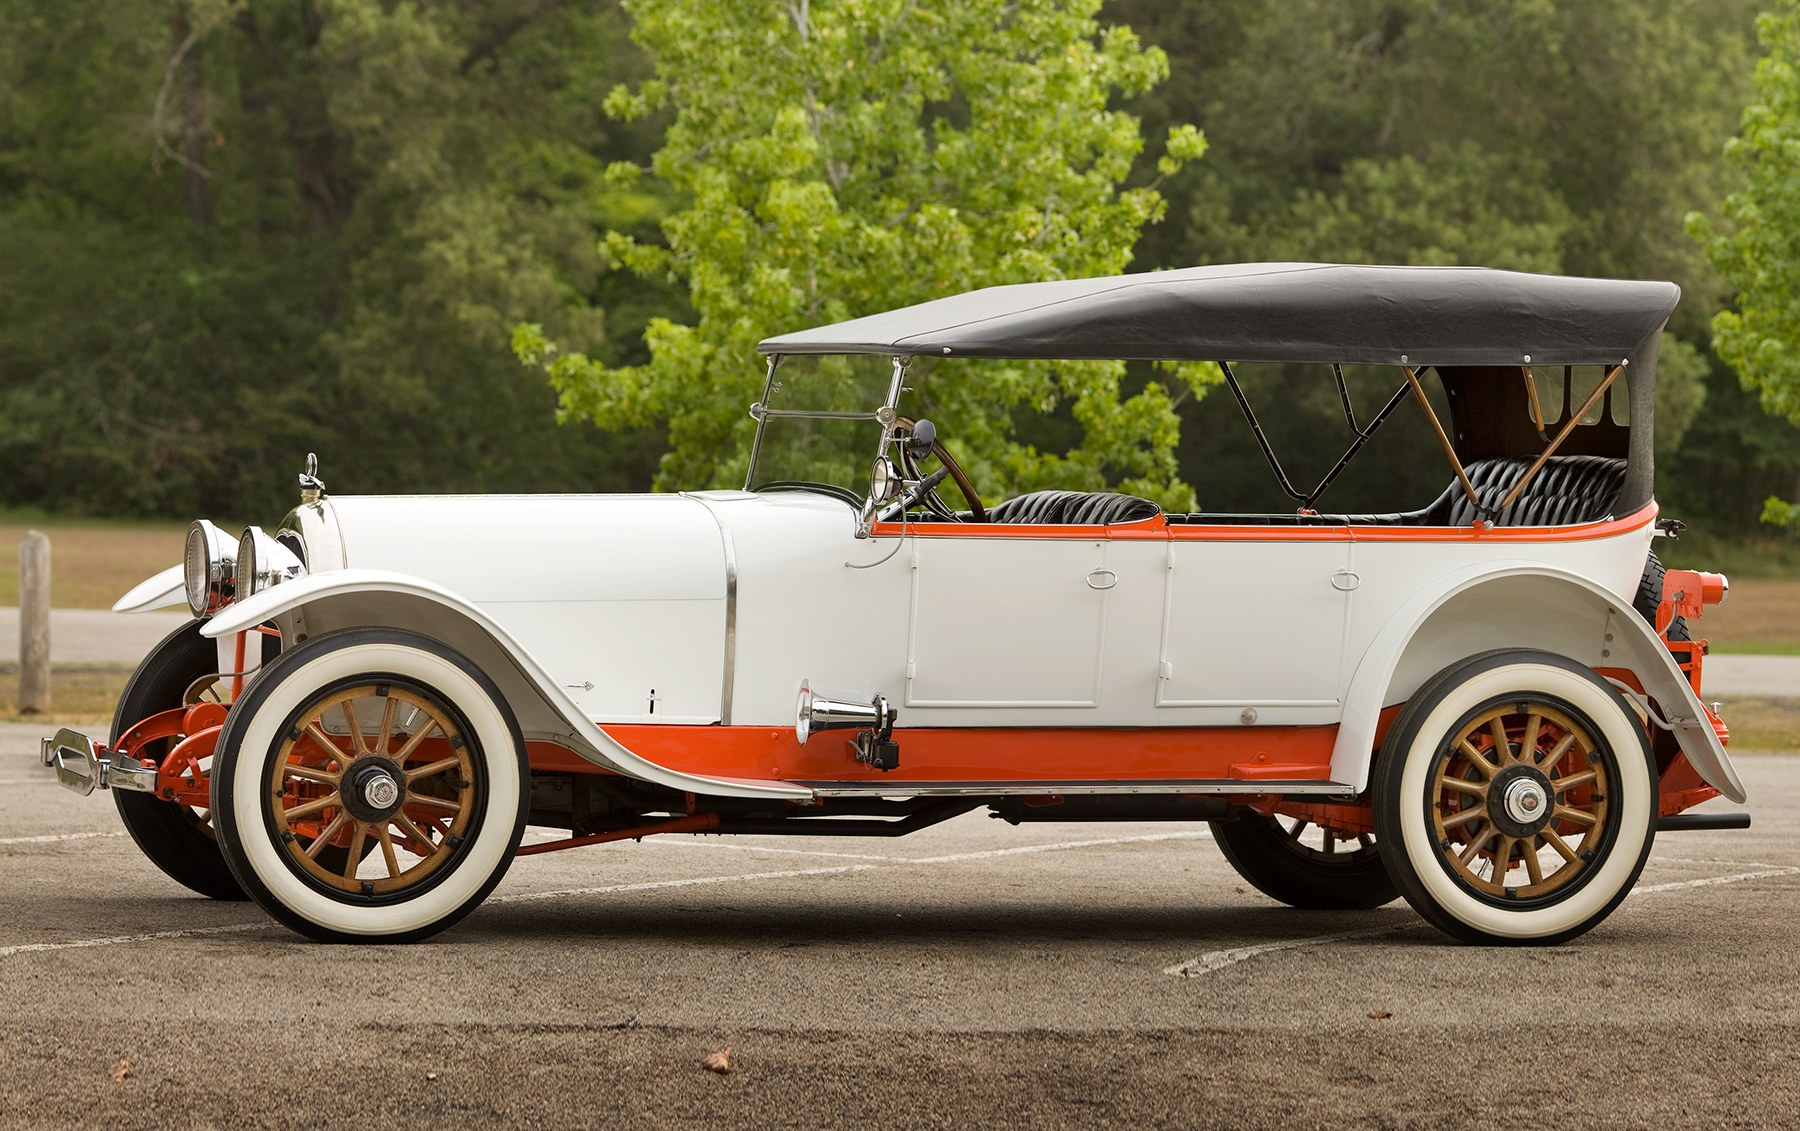 1916 Simplex Crane Model 5 Seven-Passenger Touring Car